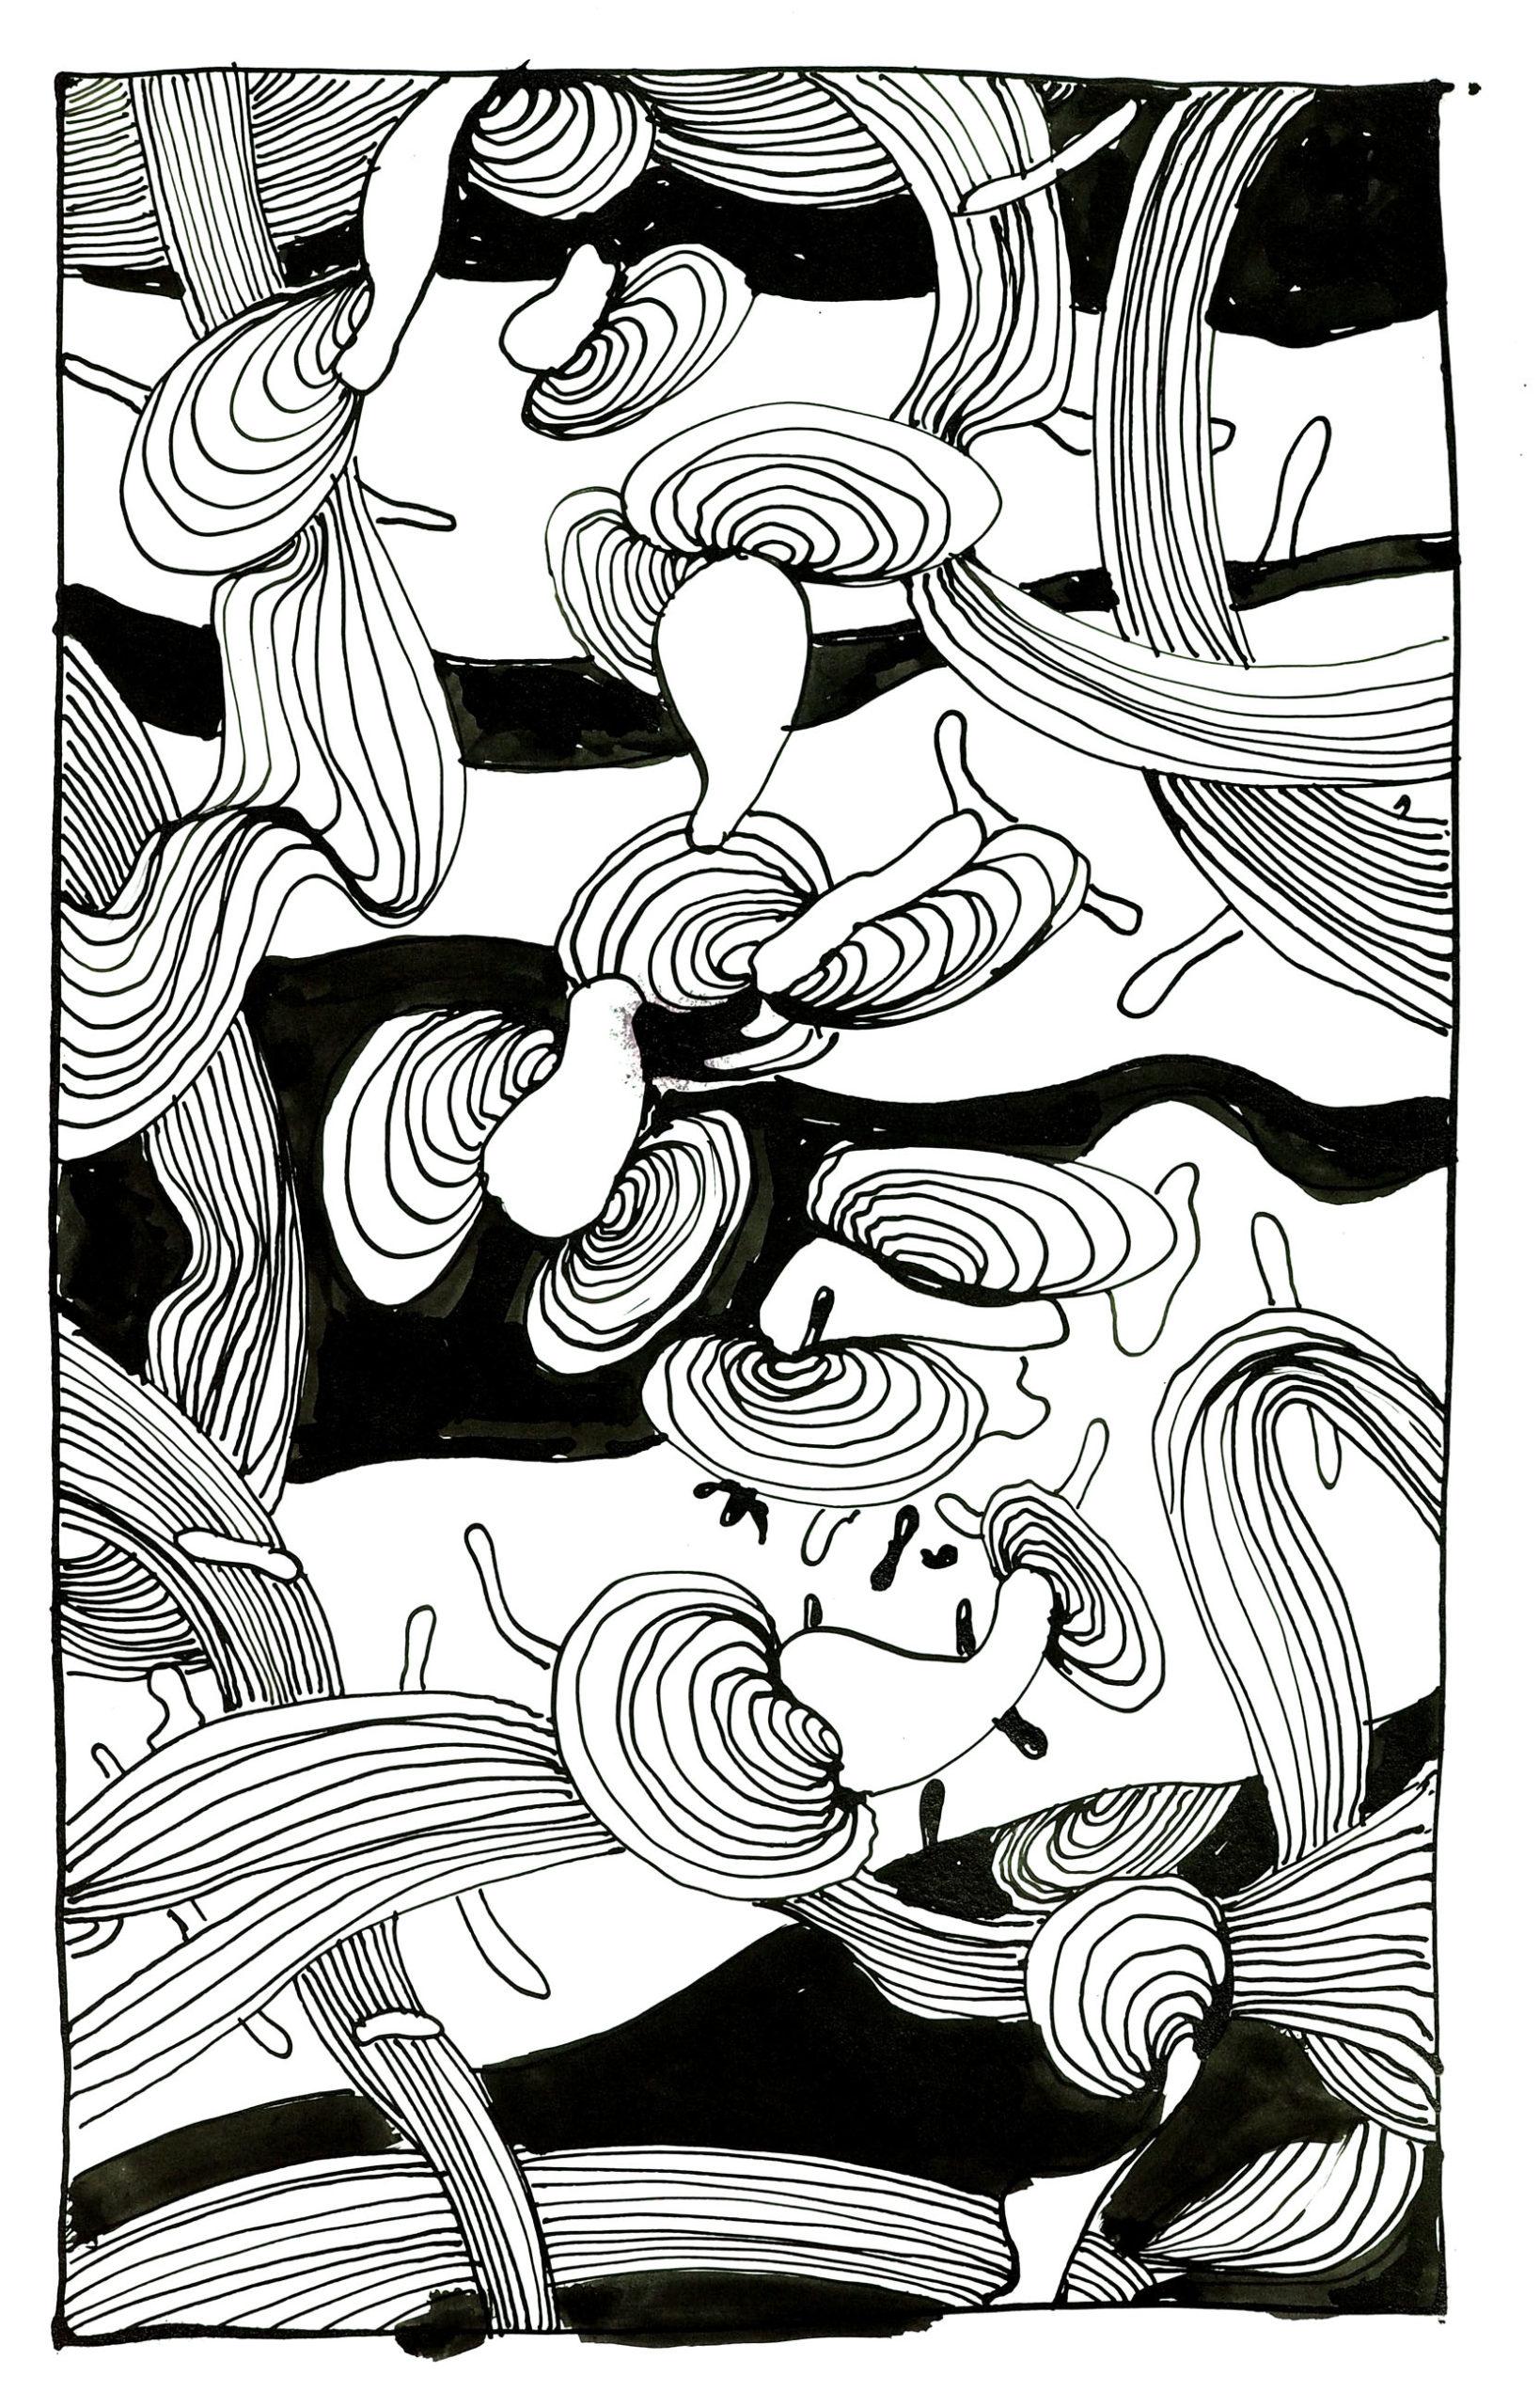 Artur Kepili Abstract compositions